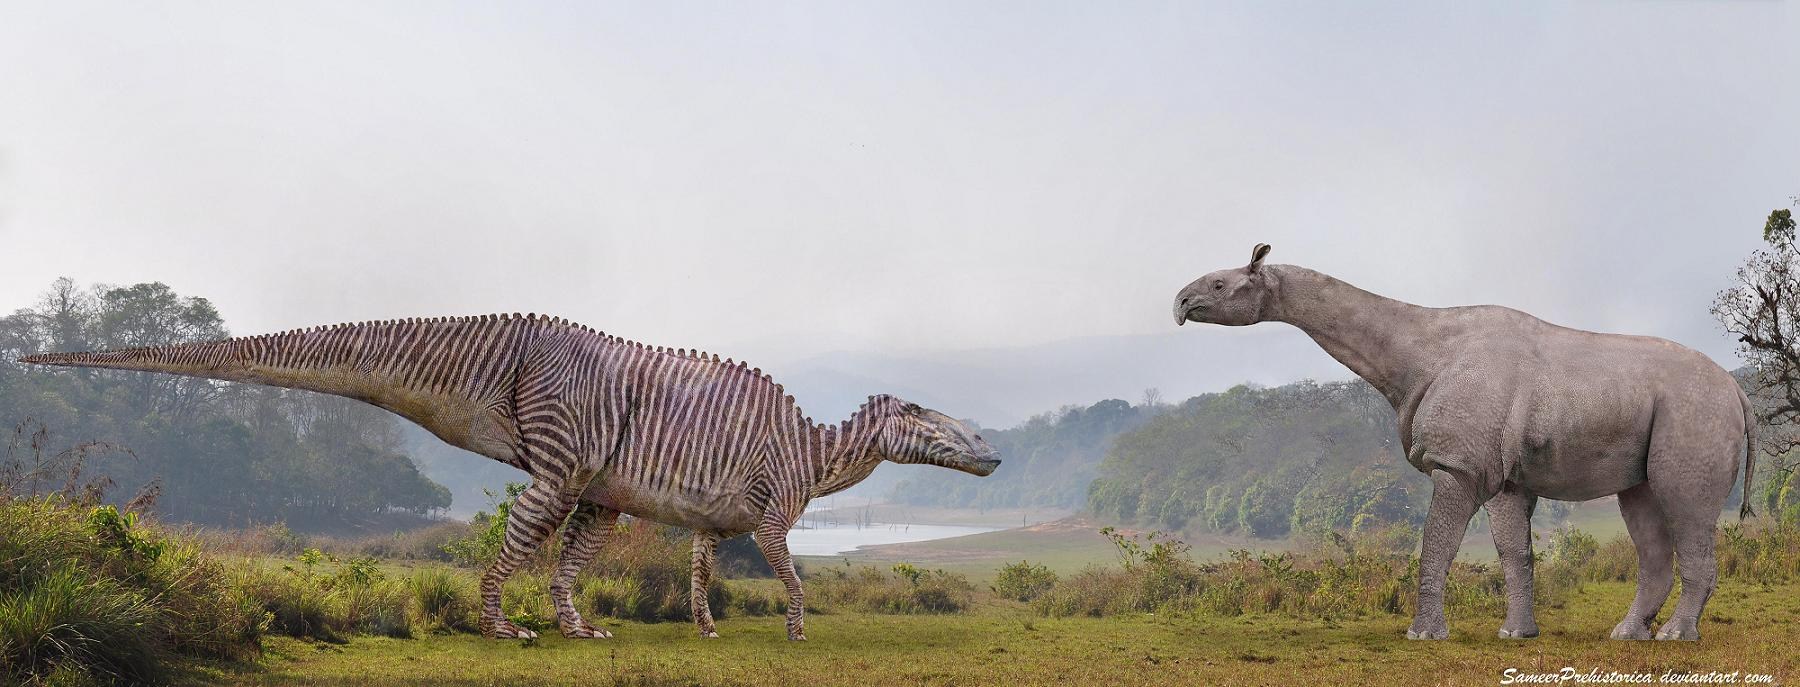 Shantungosaurus vs Paraceratherium by SameerPrehistorica